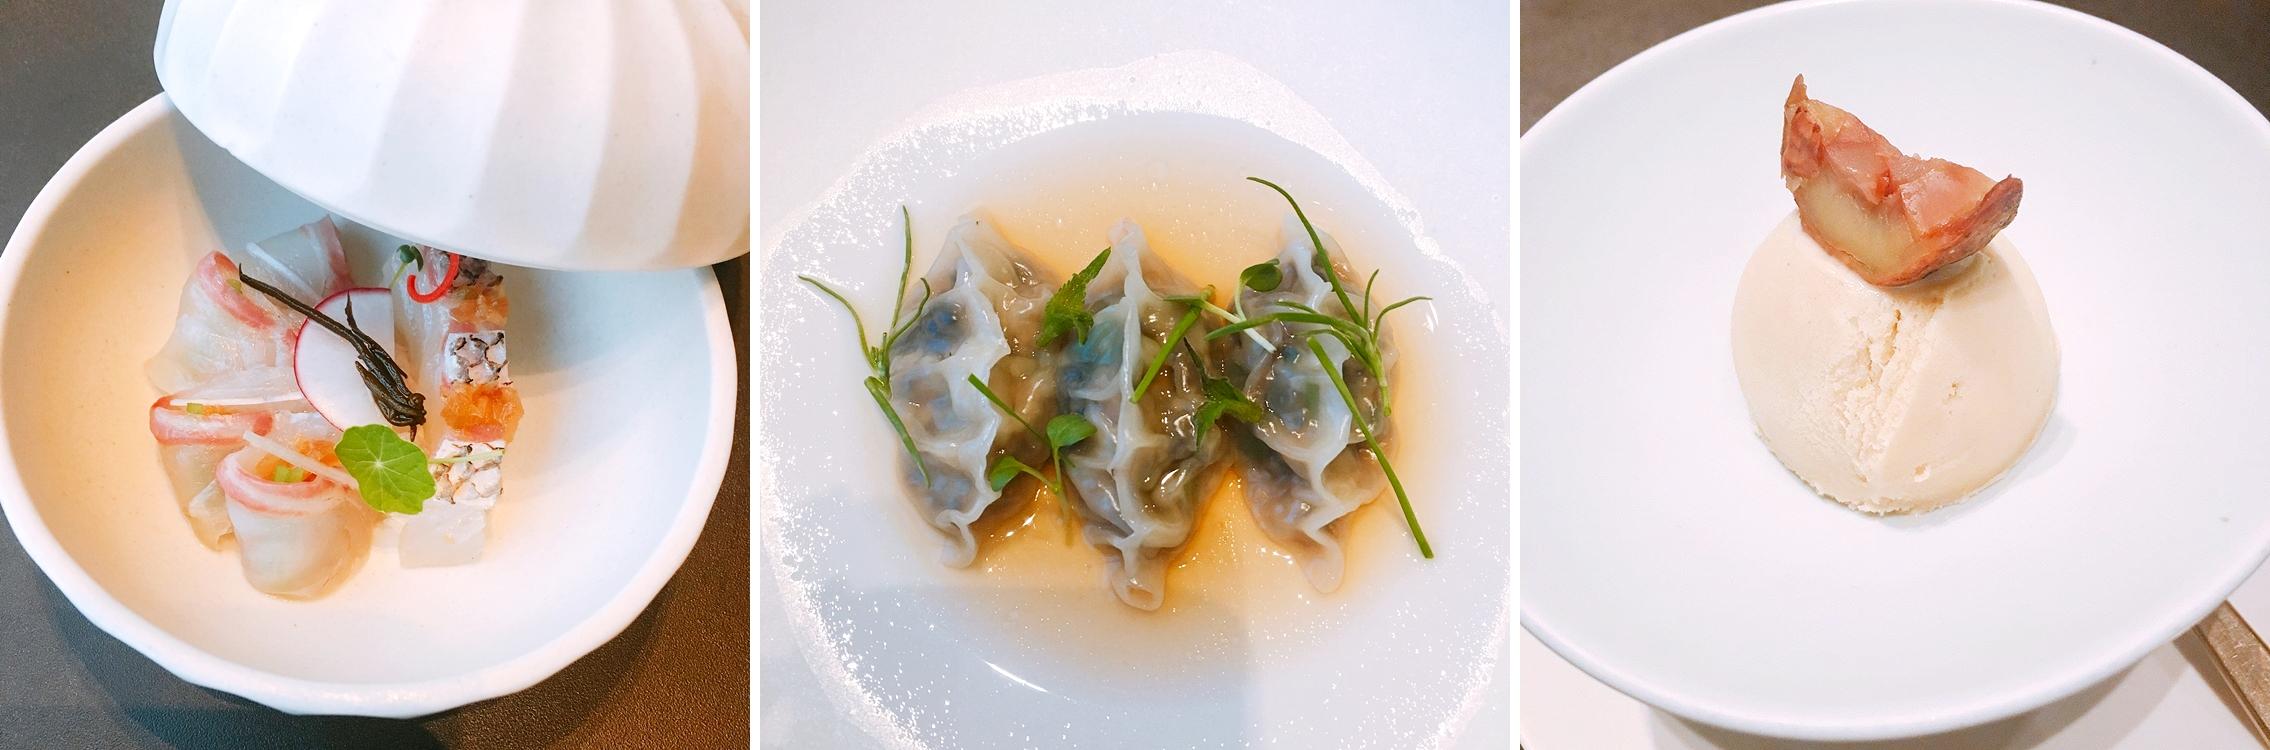 Seoul Restaurants view Korea - bicena food pure innocence course